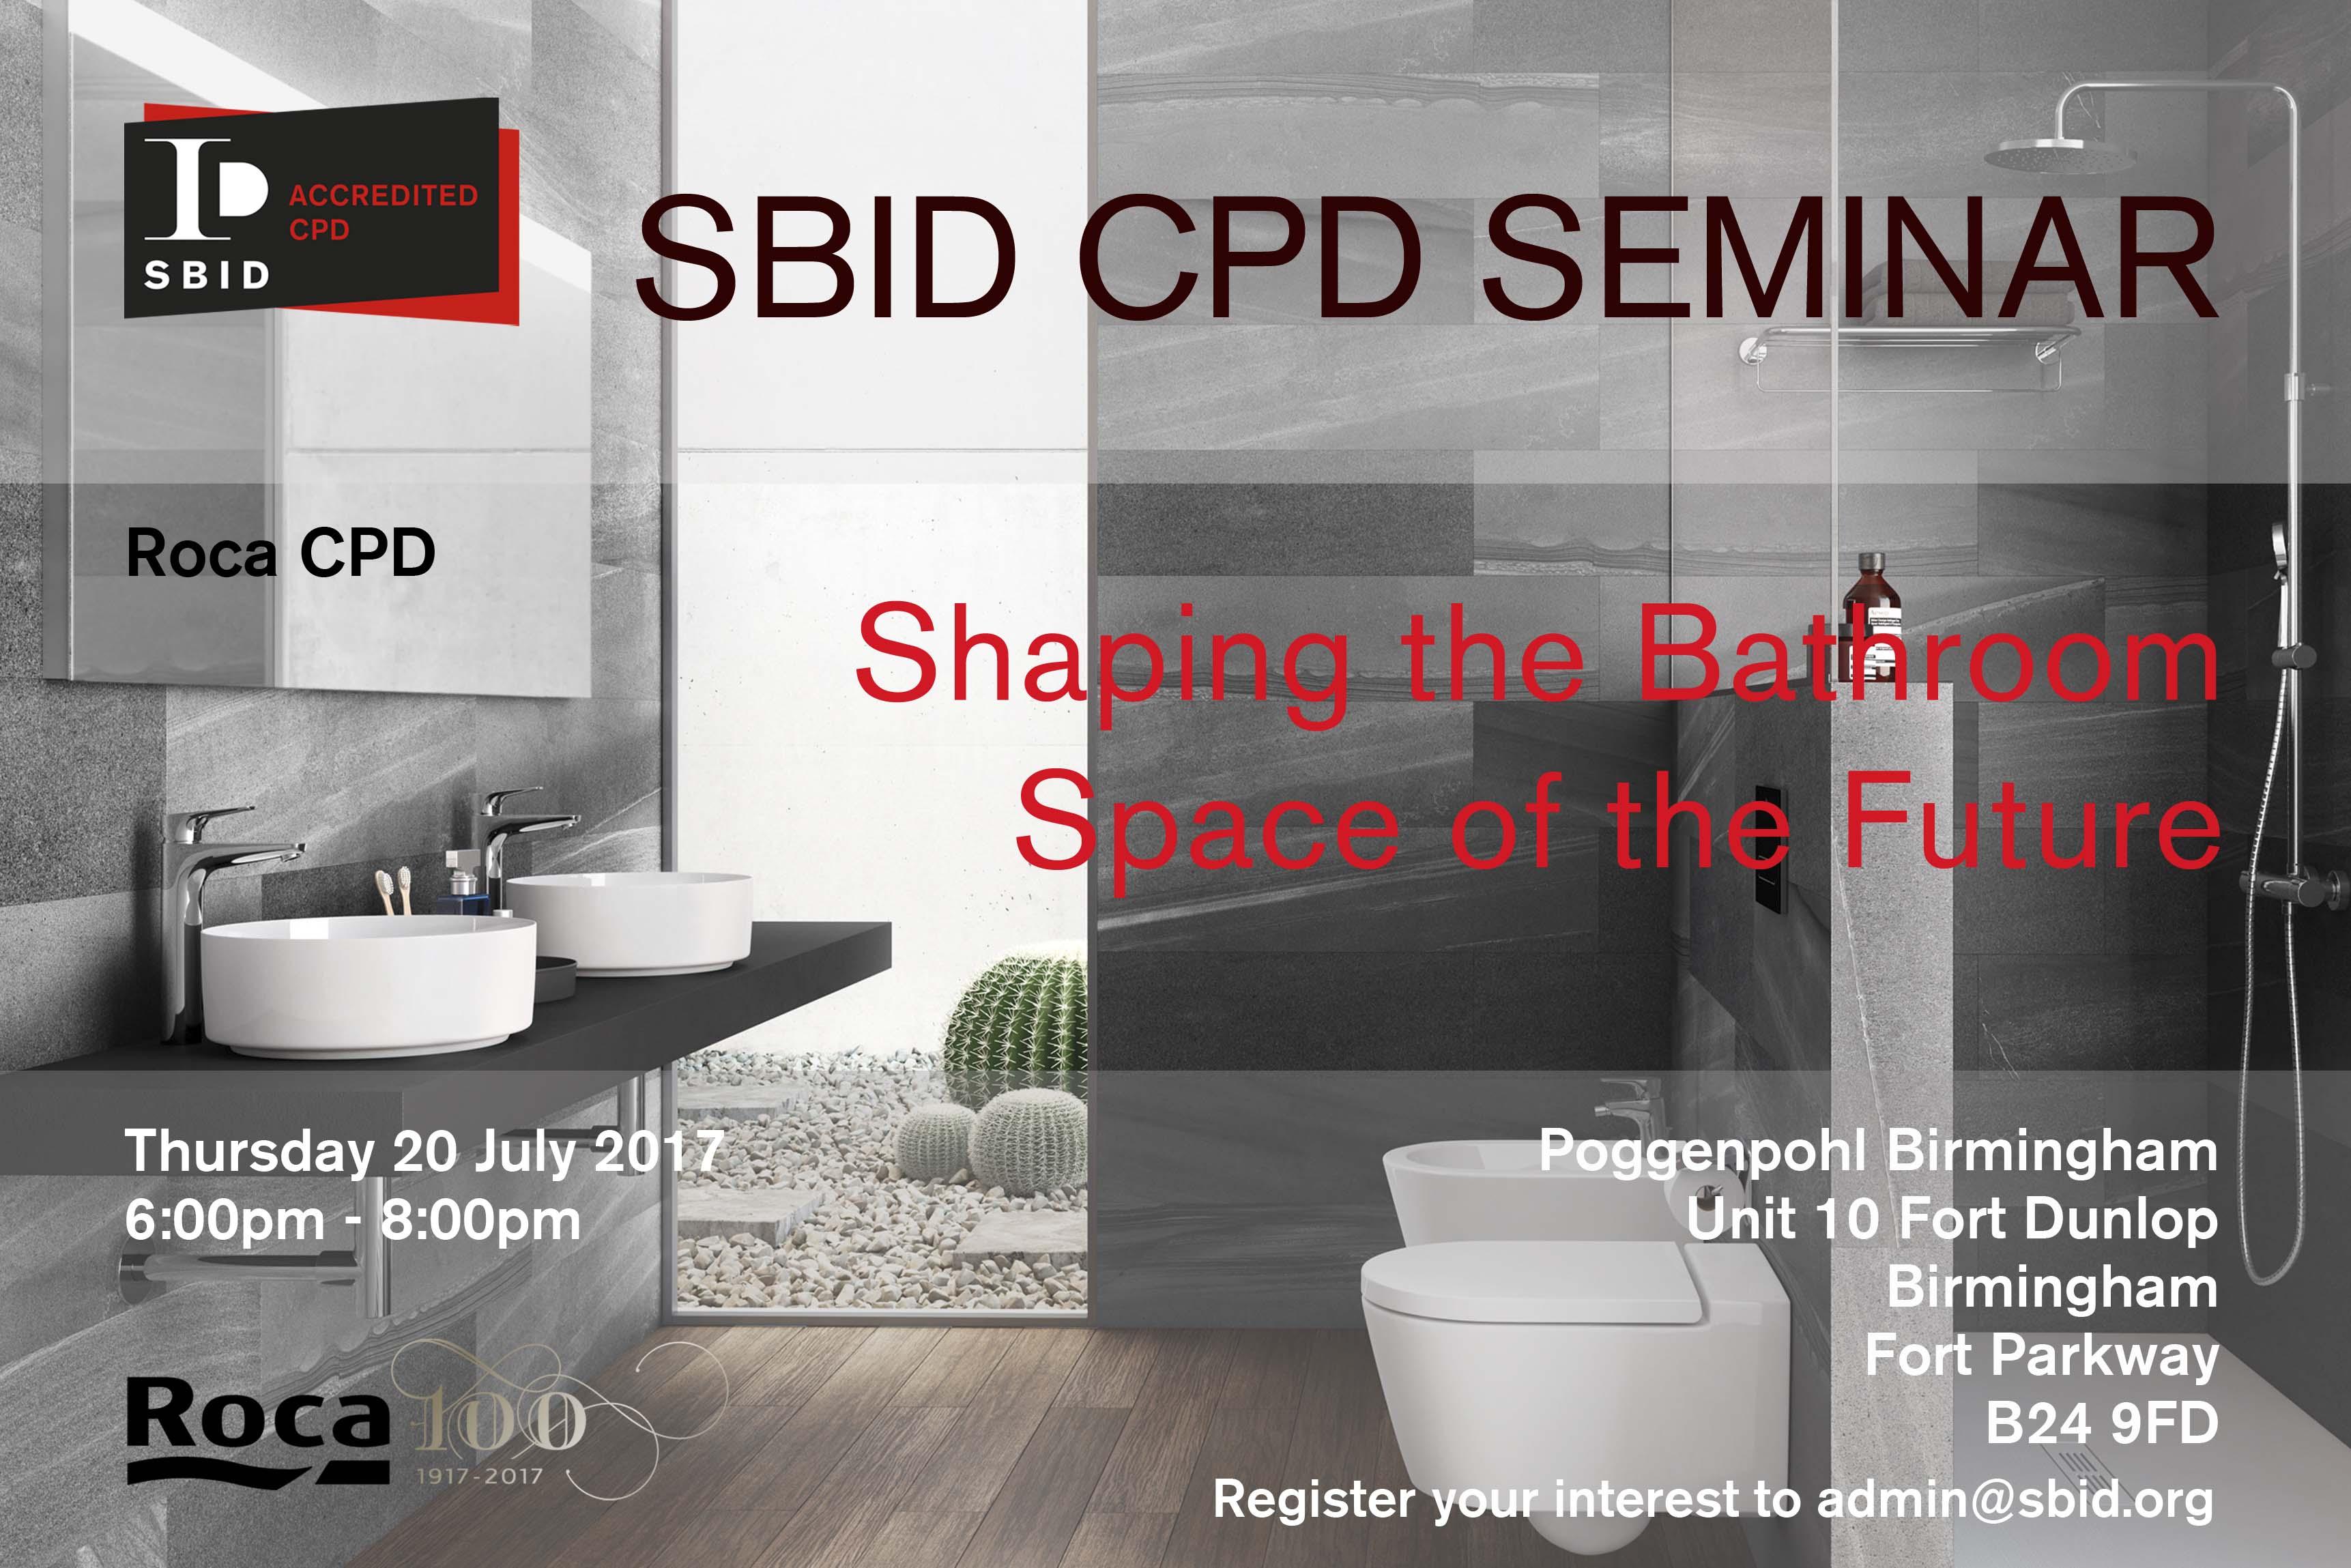 SBBID CPD Seminar